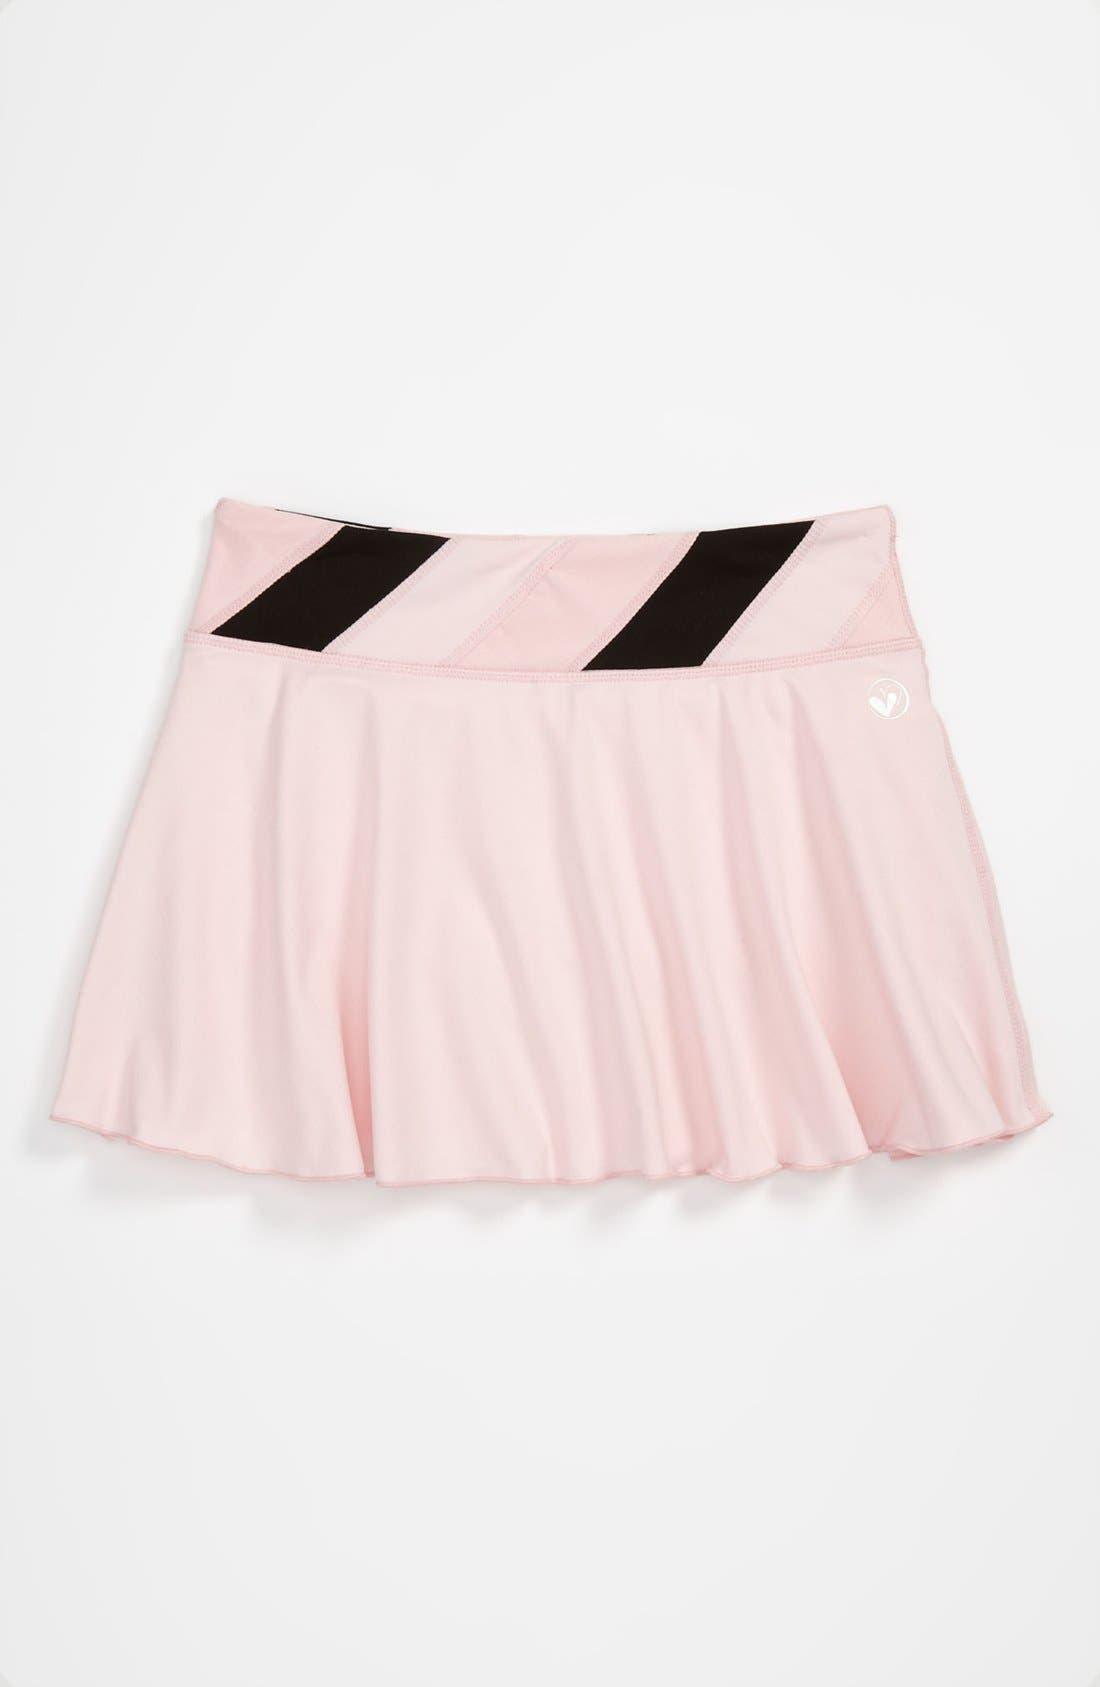 Main Image - Limeapple Scooter Skirt (Little Girls & Big Girls)